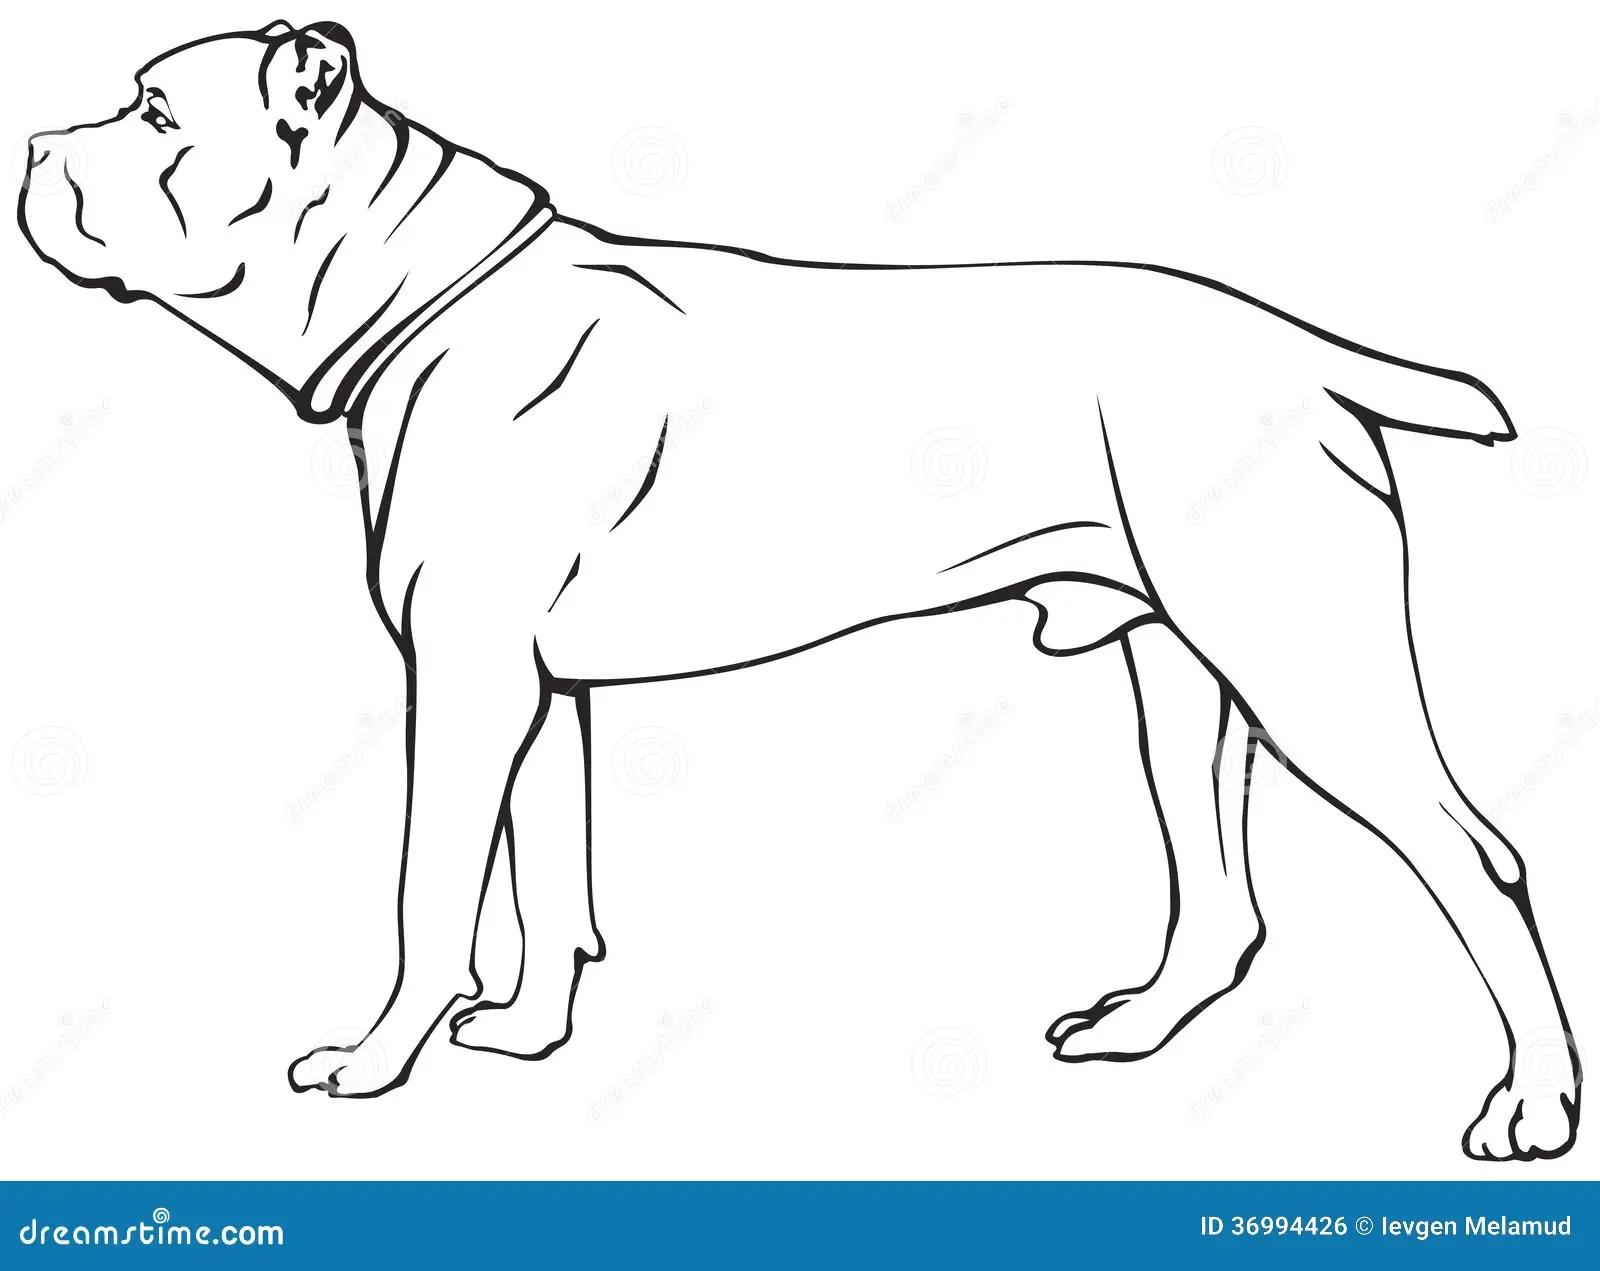 Cane Corso Dog Breed Royalty Free Stock Image